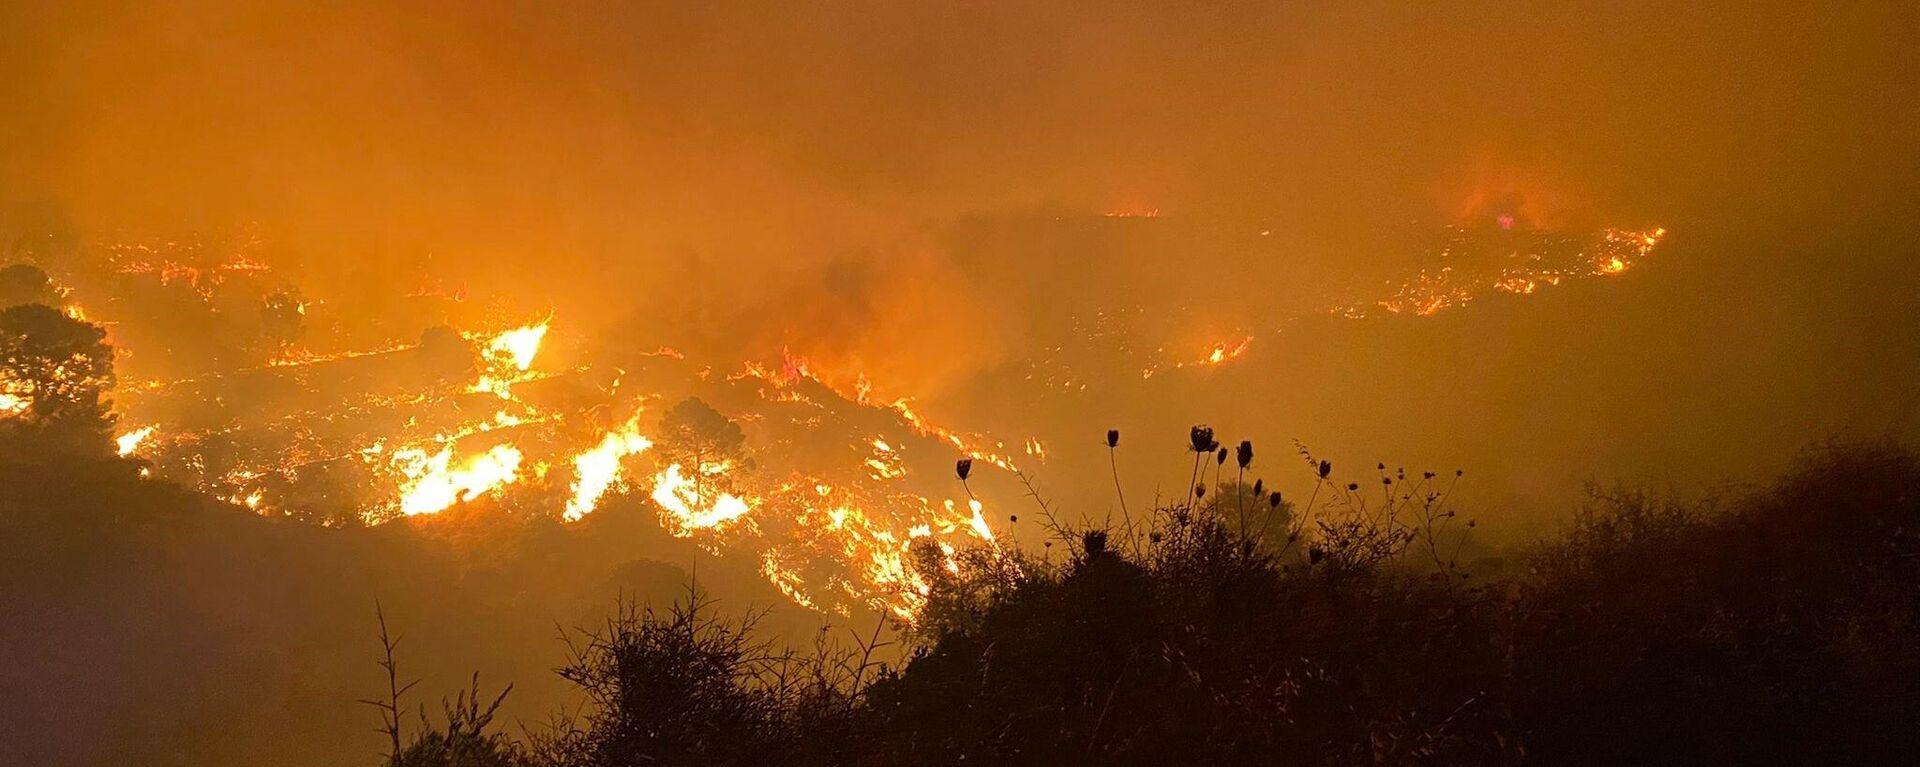 Incendio en Sierra Bermeja, Málaga, en septiembre de 2021 - Sputnik Mundo, 1920, 09.09.2021